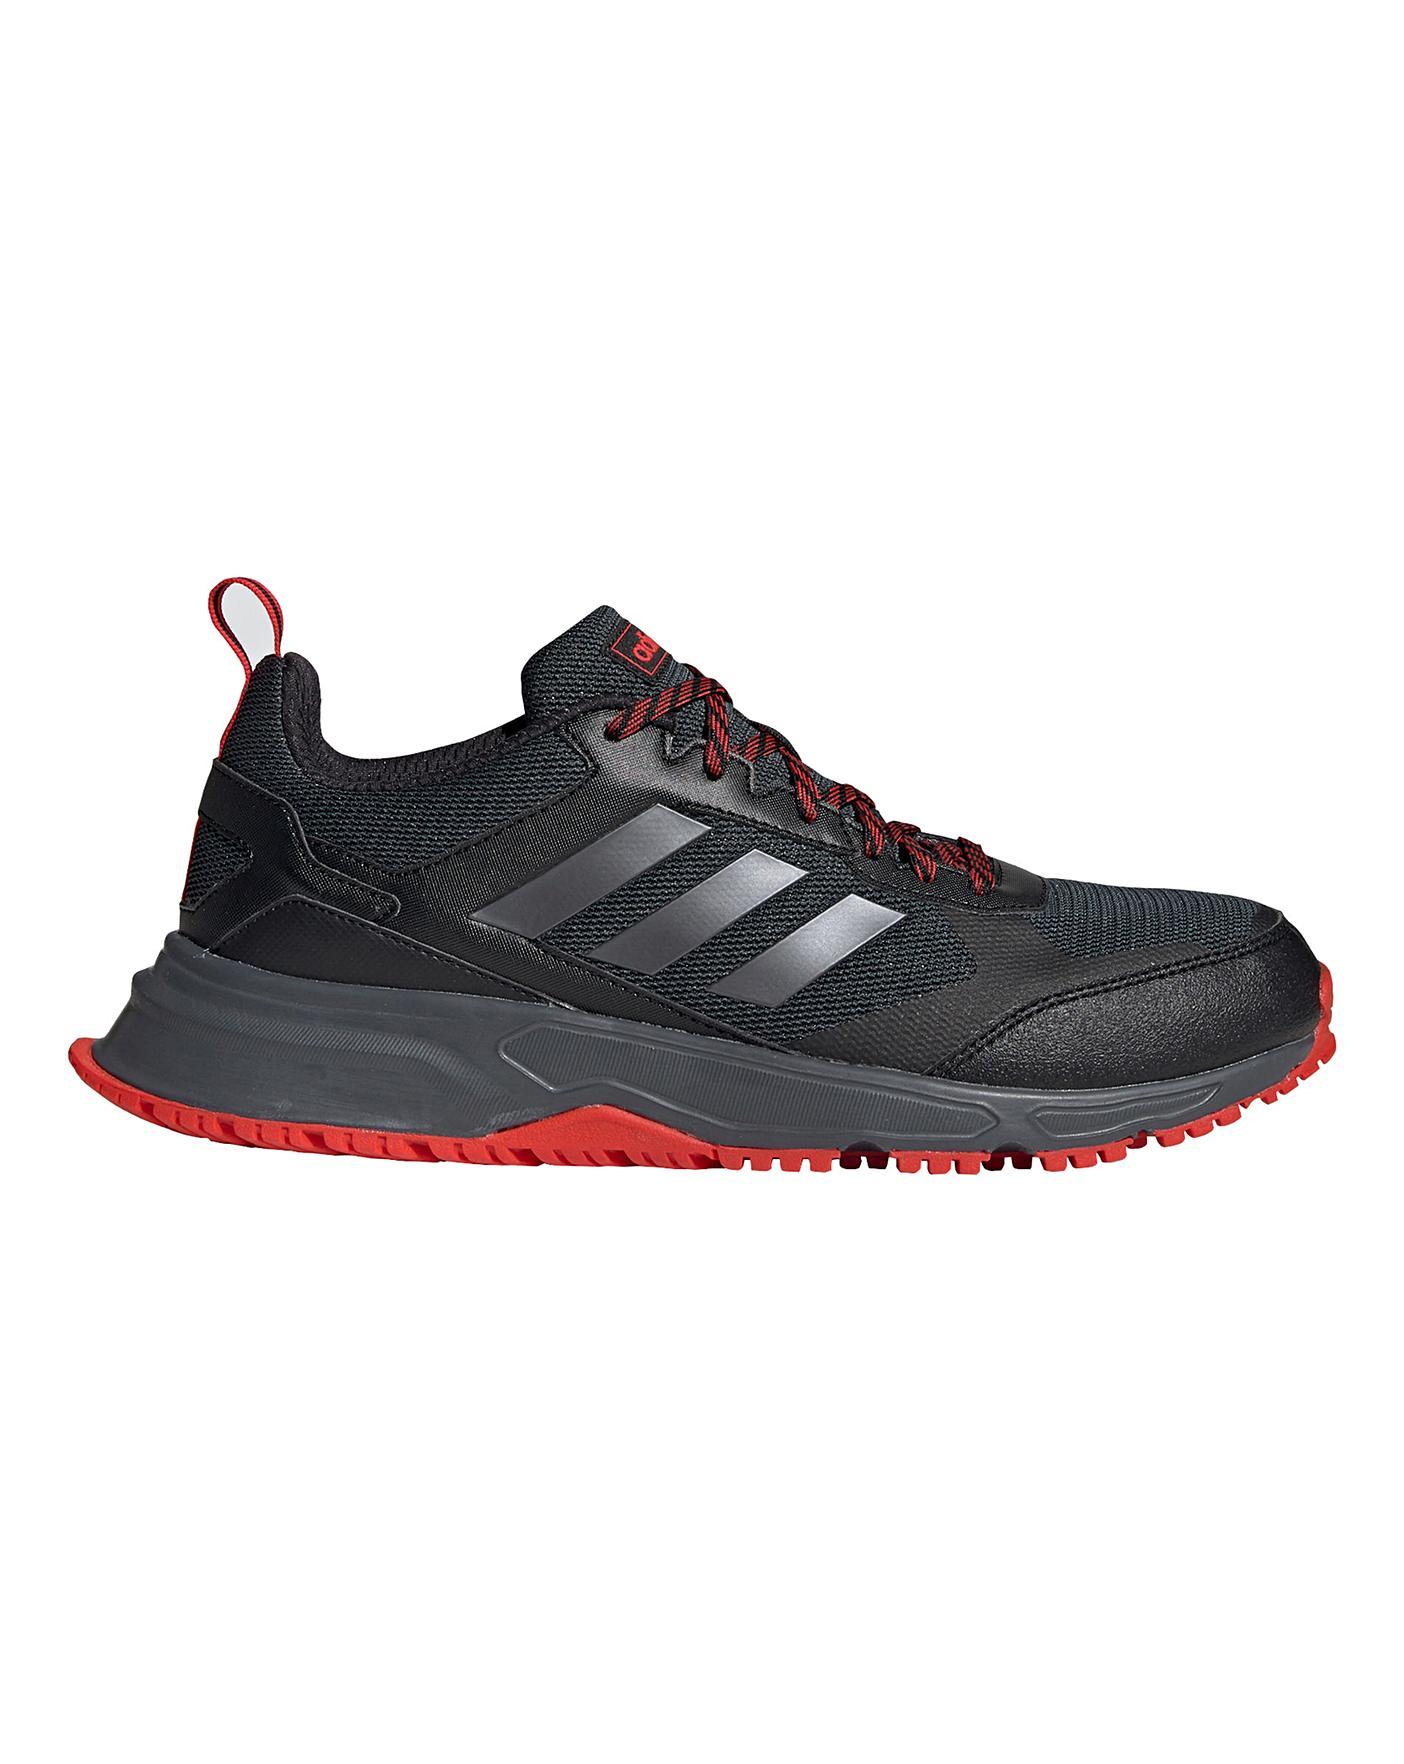 adidas Rockadia Trail 3.0 Trainers